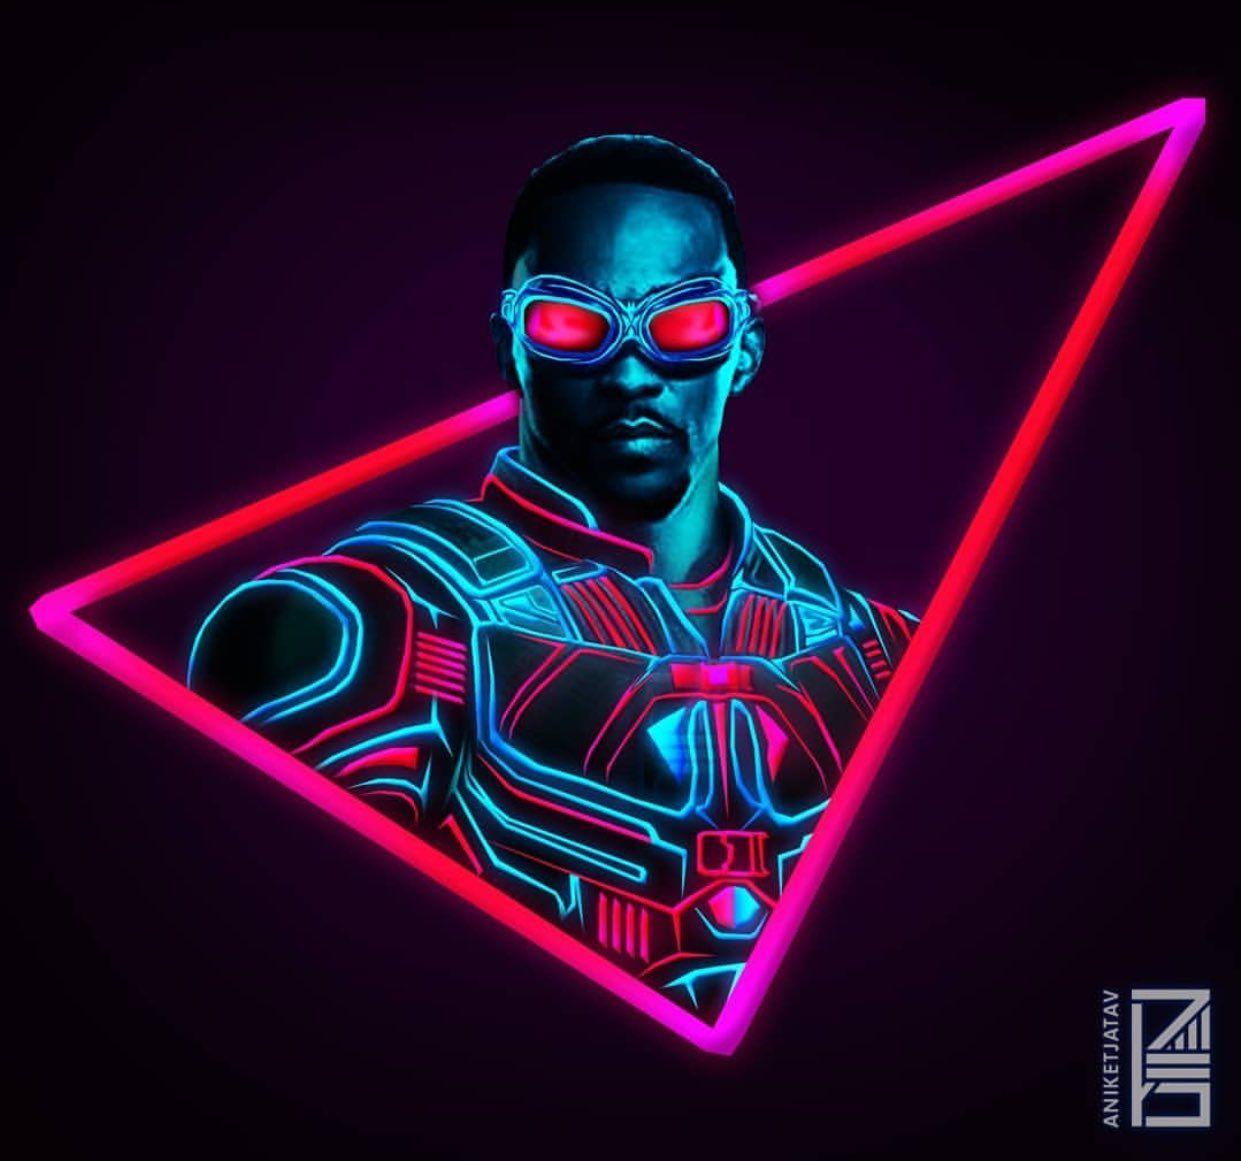 Neon Marvels Artwork Falcon Marvel Superhelden Plakat Marvel Comic Helden